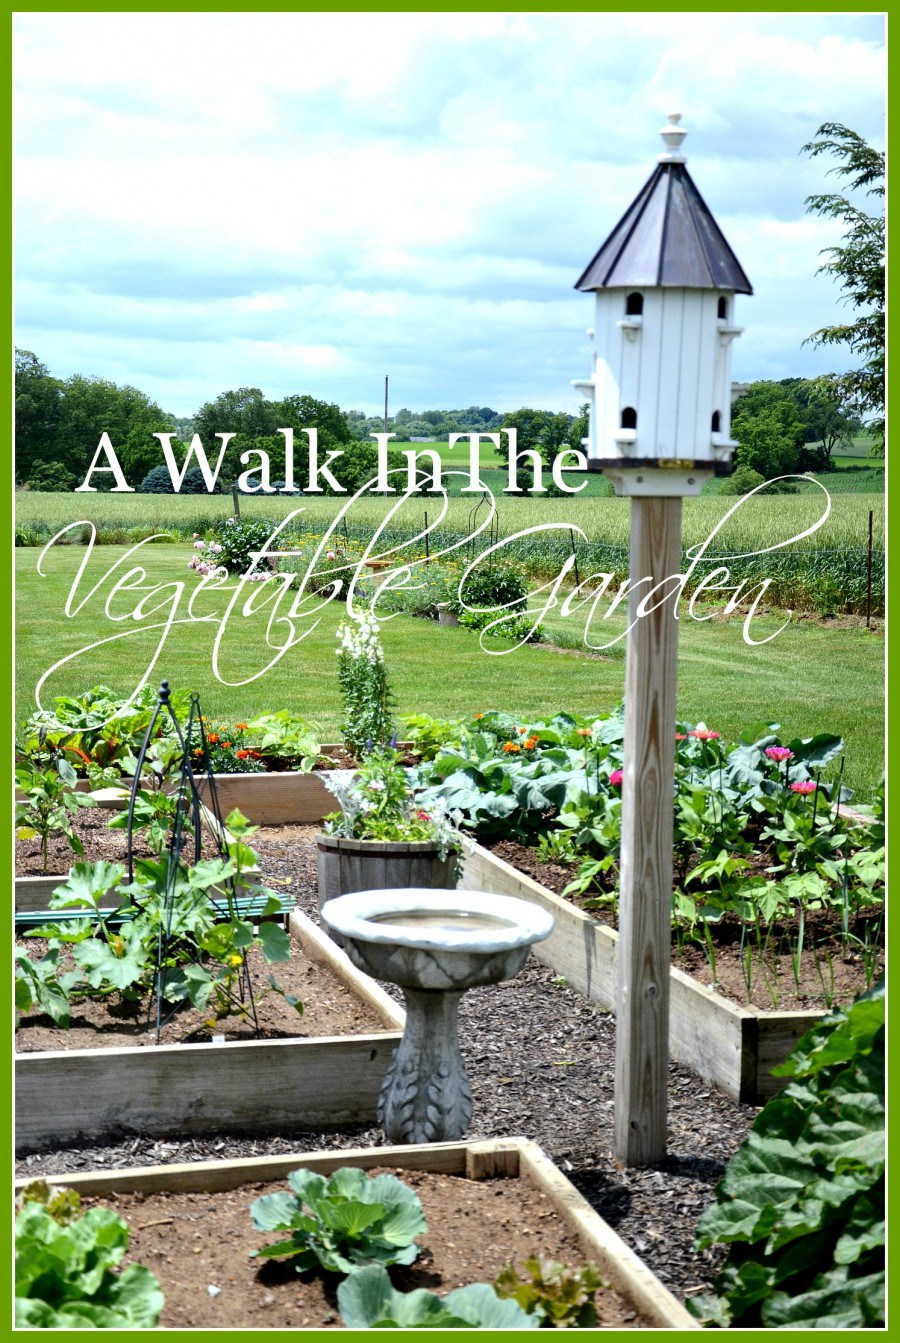 VEGETABLE GARDEN- A walk in the vegetable garden-stonegableblog.com